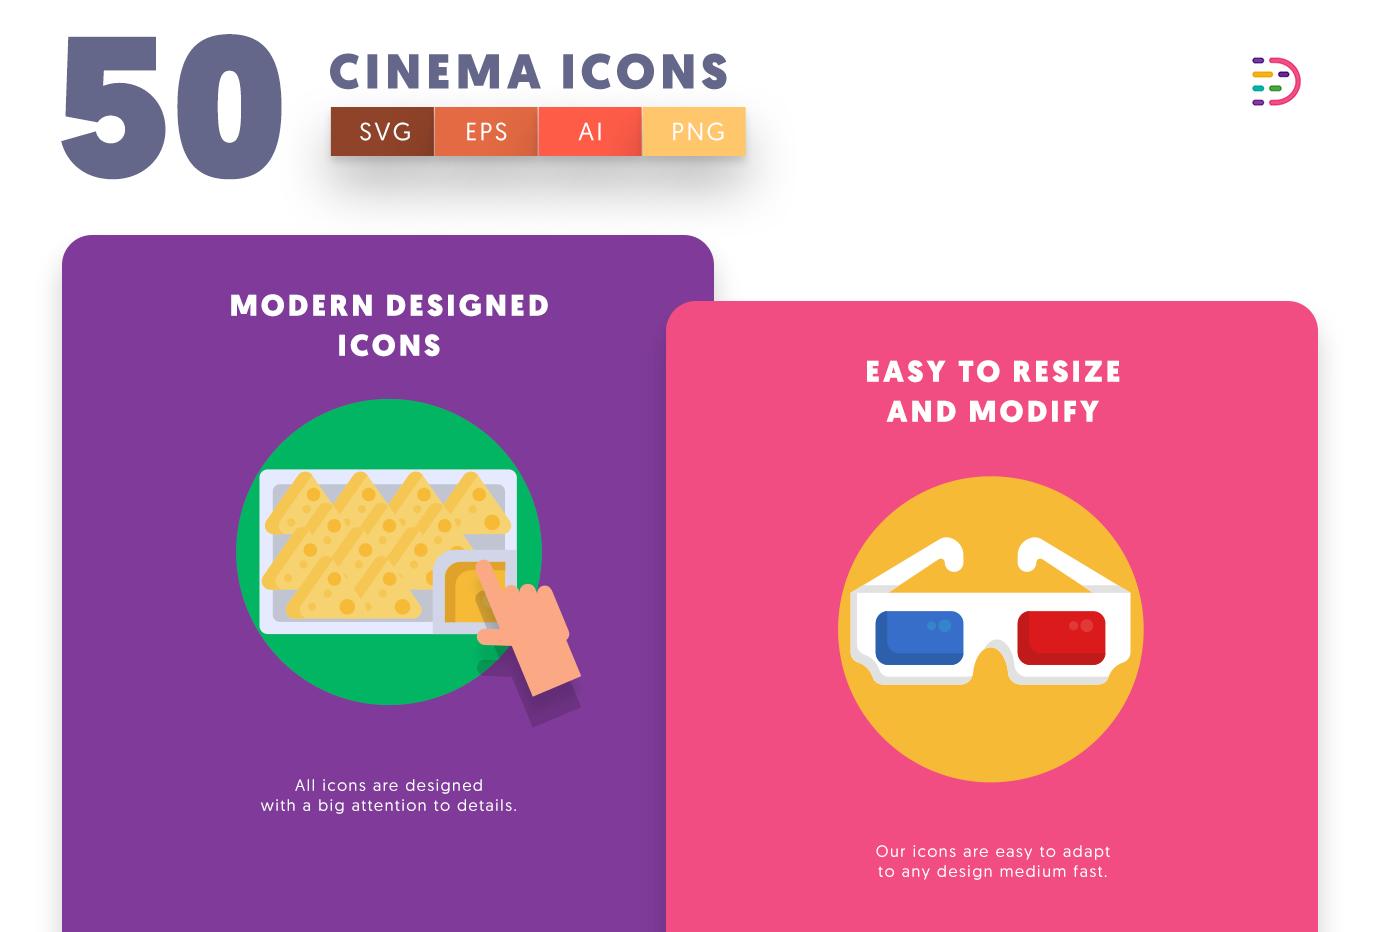 Cinema icons png/svg/eps